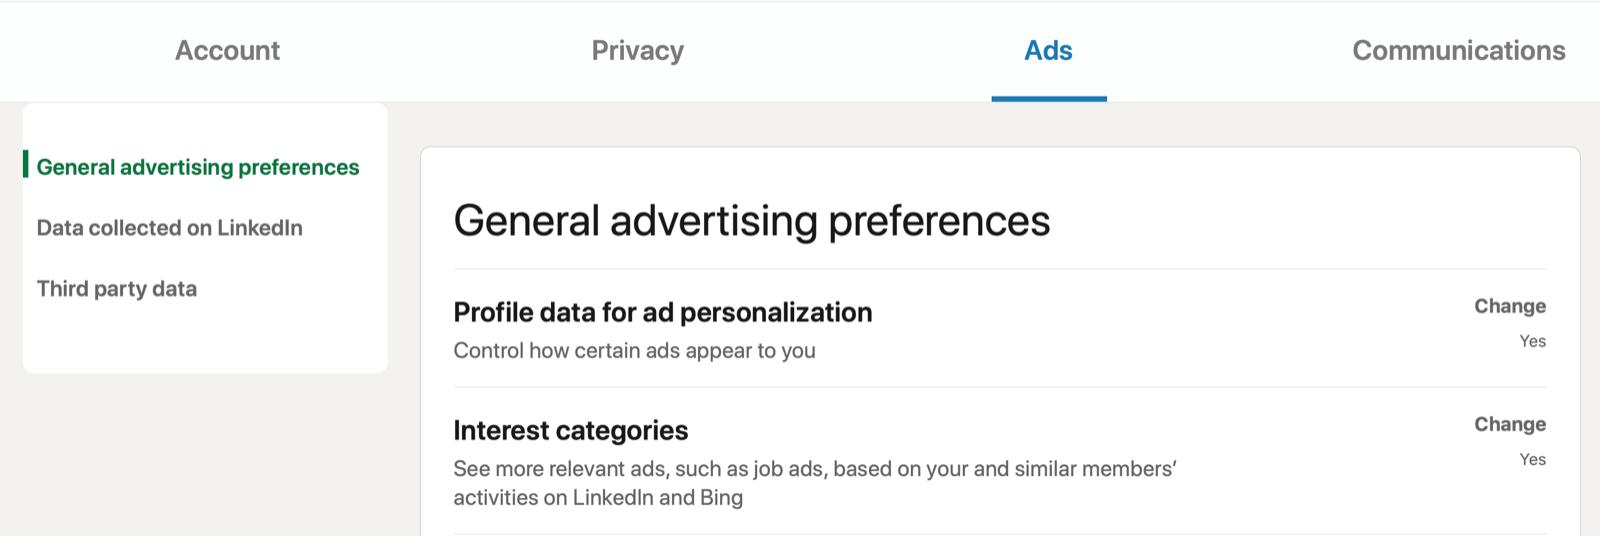 linkedin menu account settings for general advertising preferences